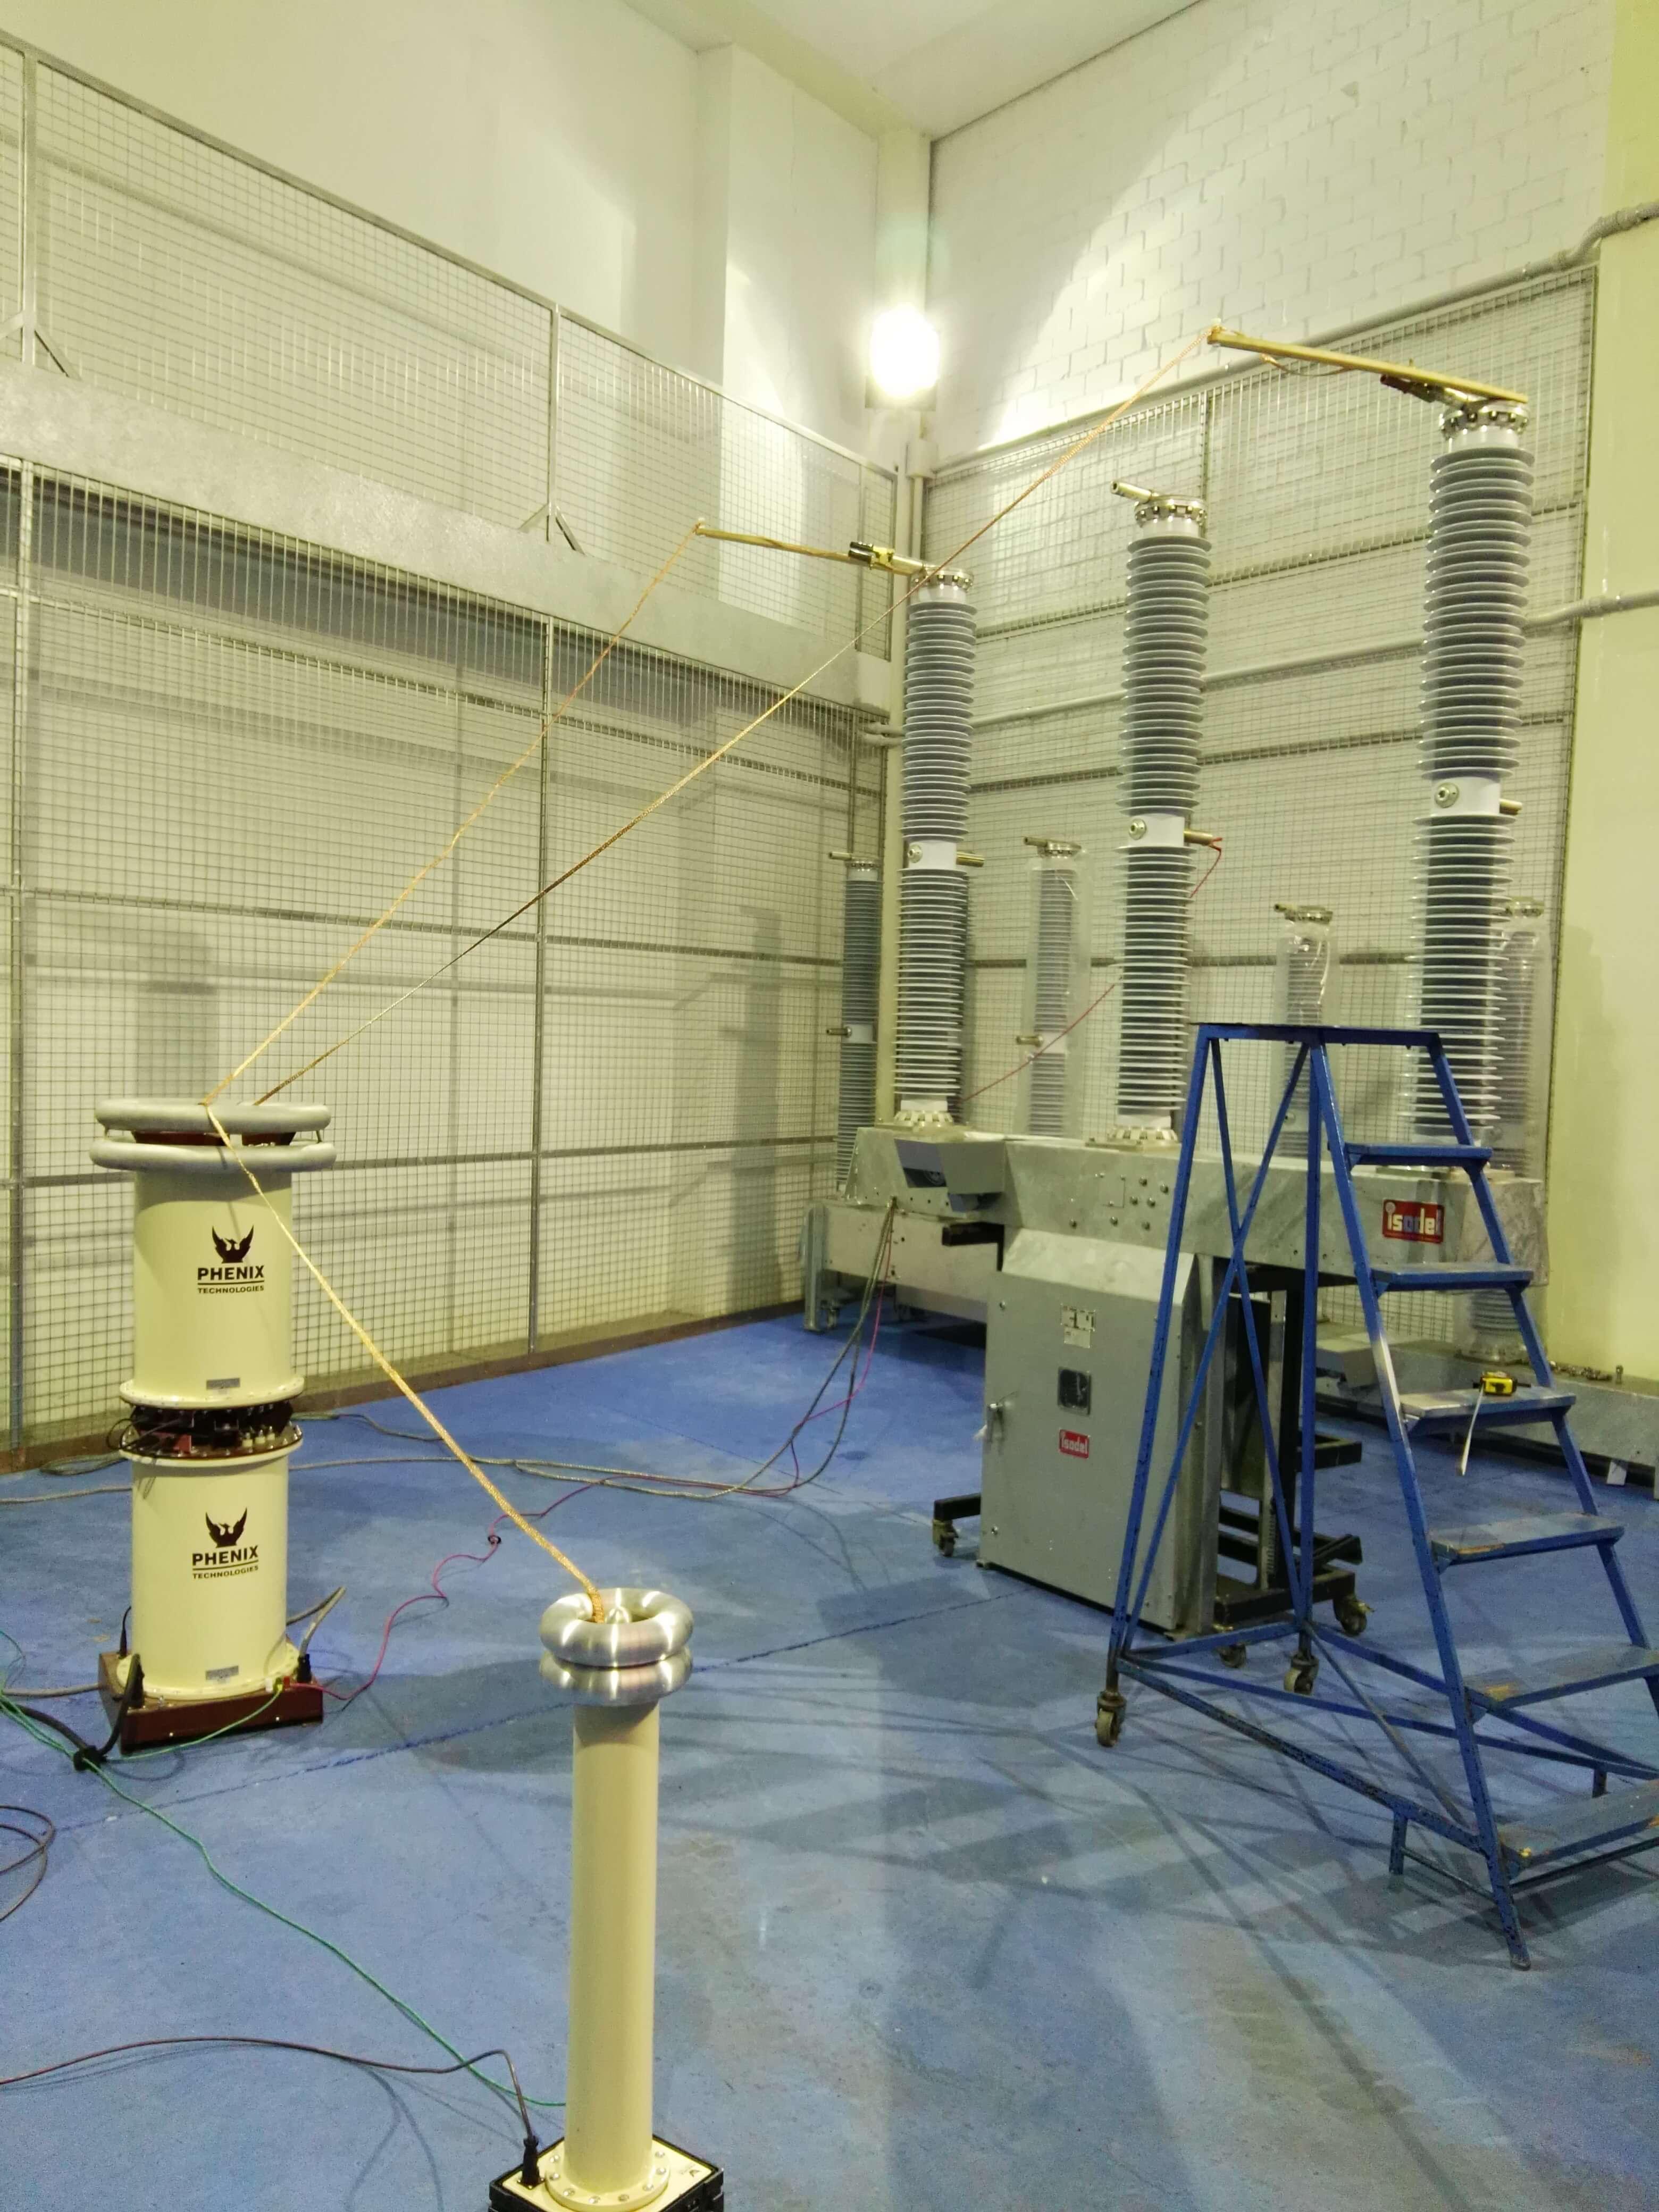 MEDIDA AISLAMIENTO INT 72,5 kV